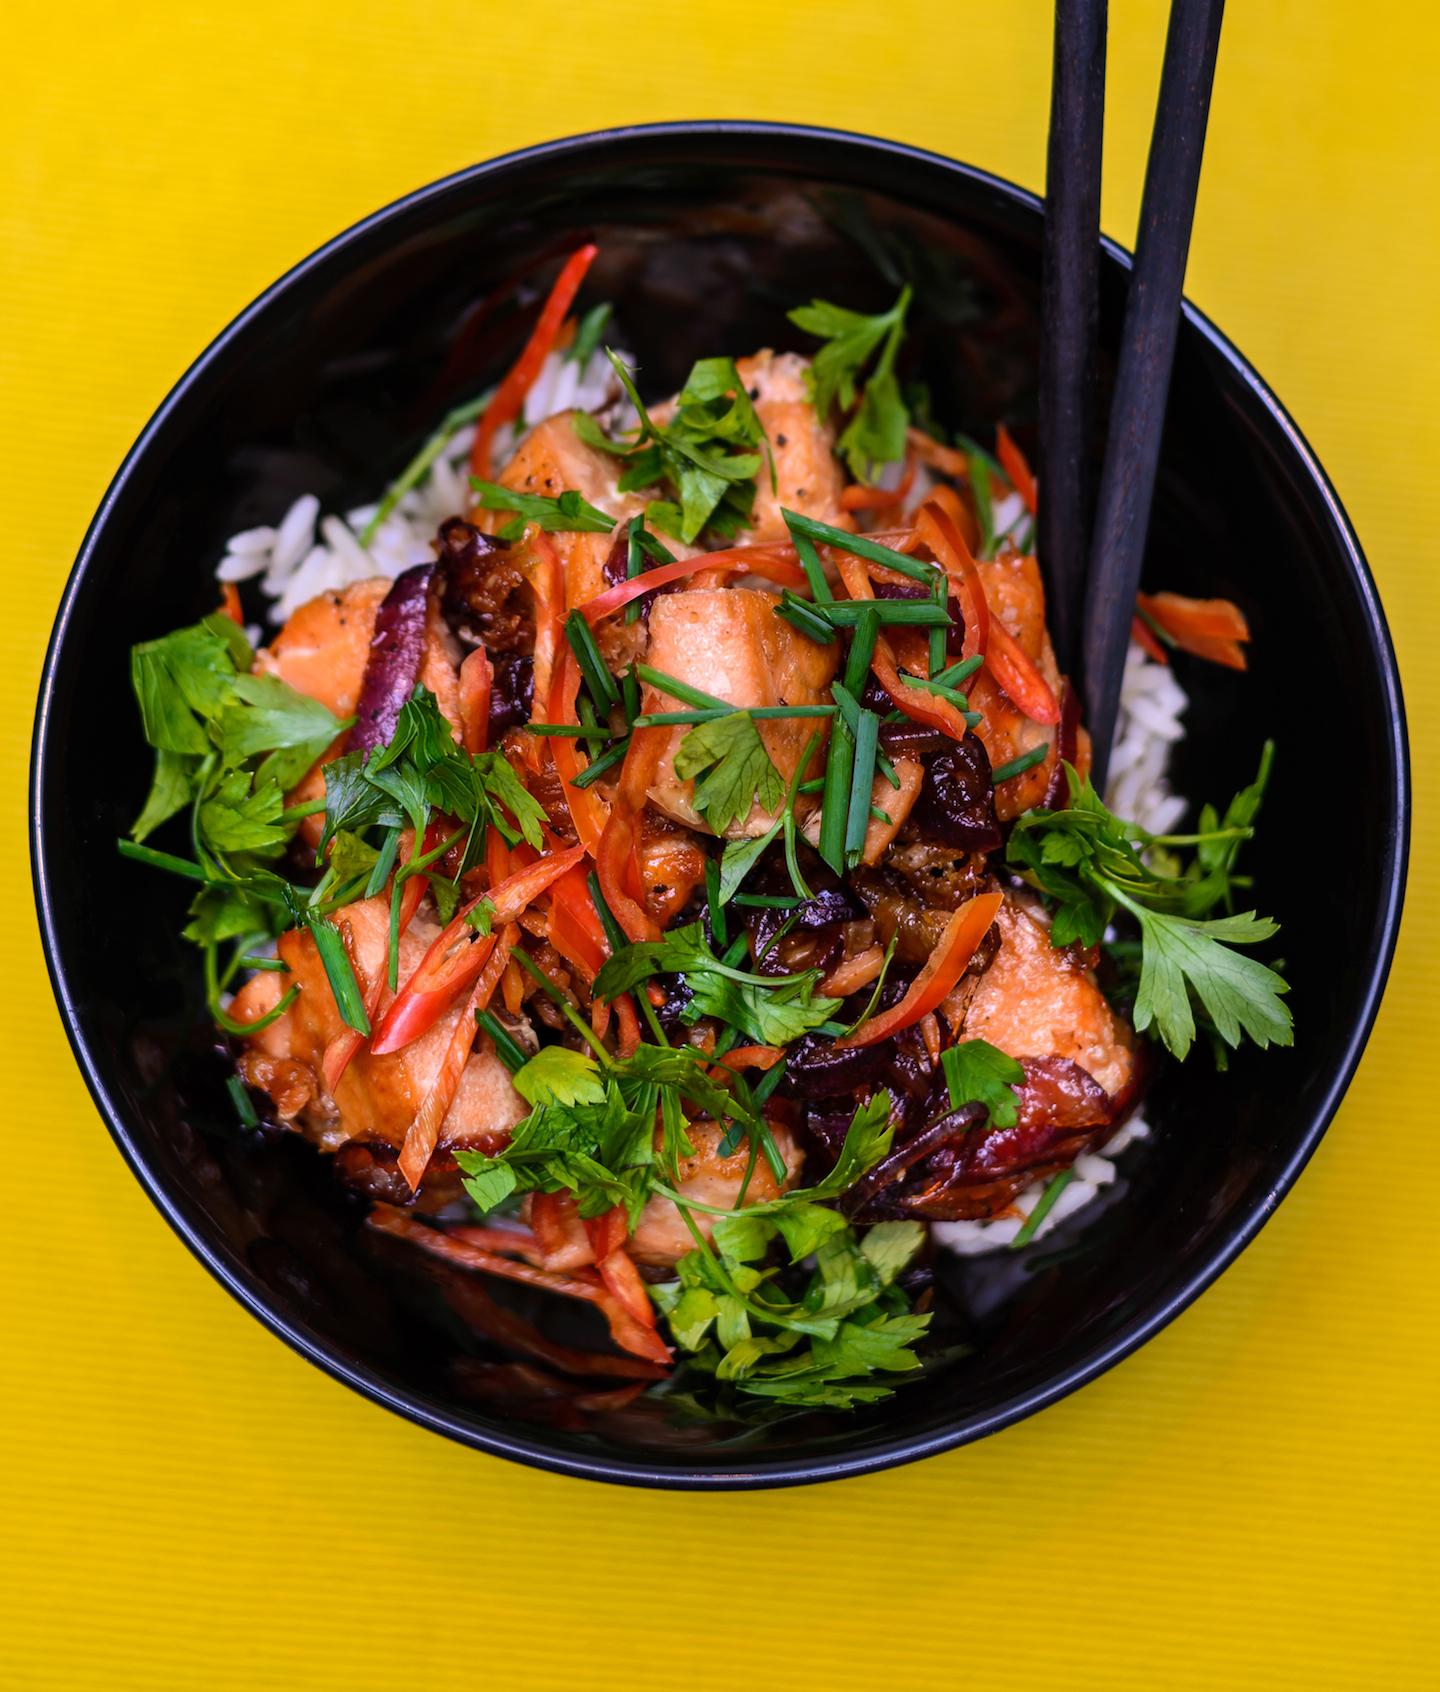 Saumon rôti, poivrons tranchés, oignon rouge, ciboulette, riz à la vapeur, coriandre ou persil, et fondant teriyaki ou sauce soja.